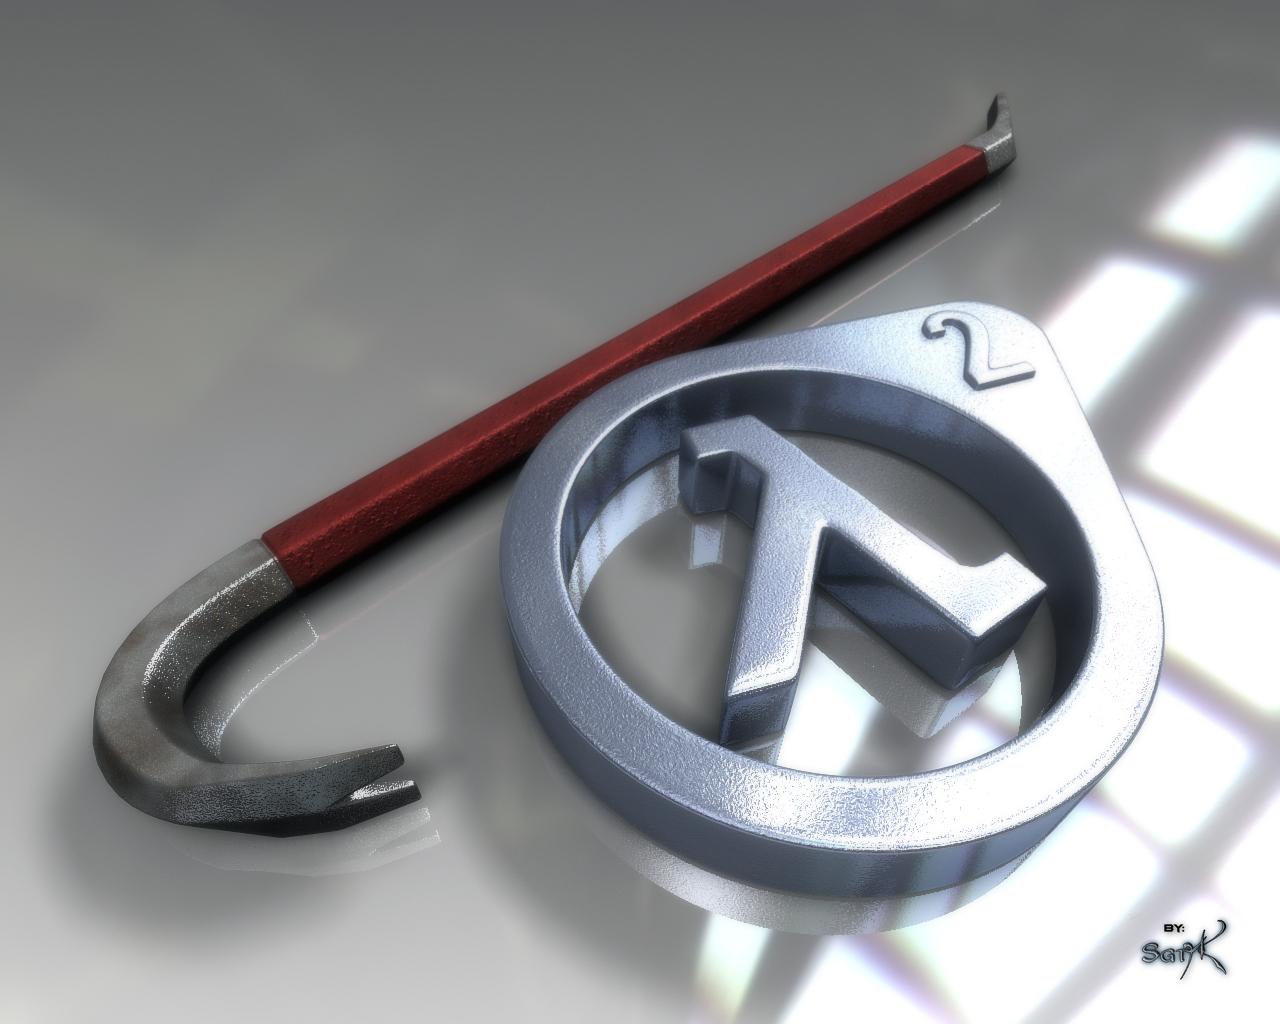 Half-Life 2 Crowbar and Lambda by SgtHK on DeviantArt